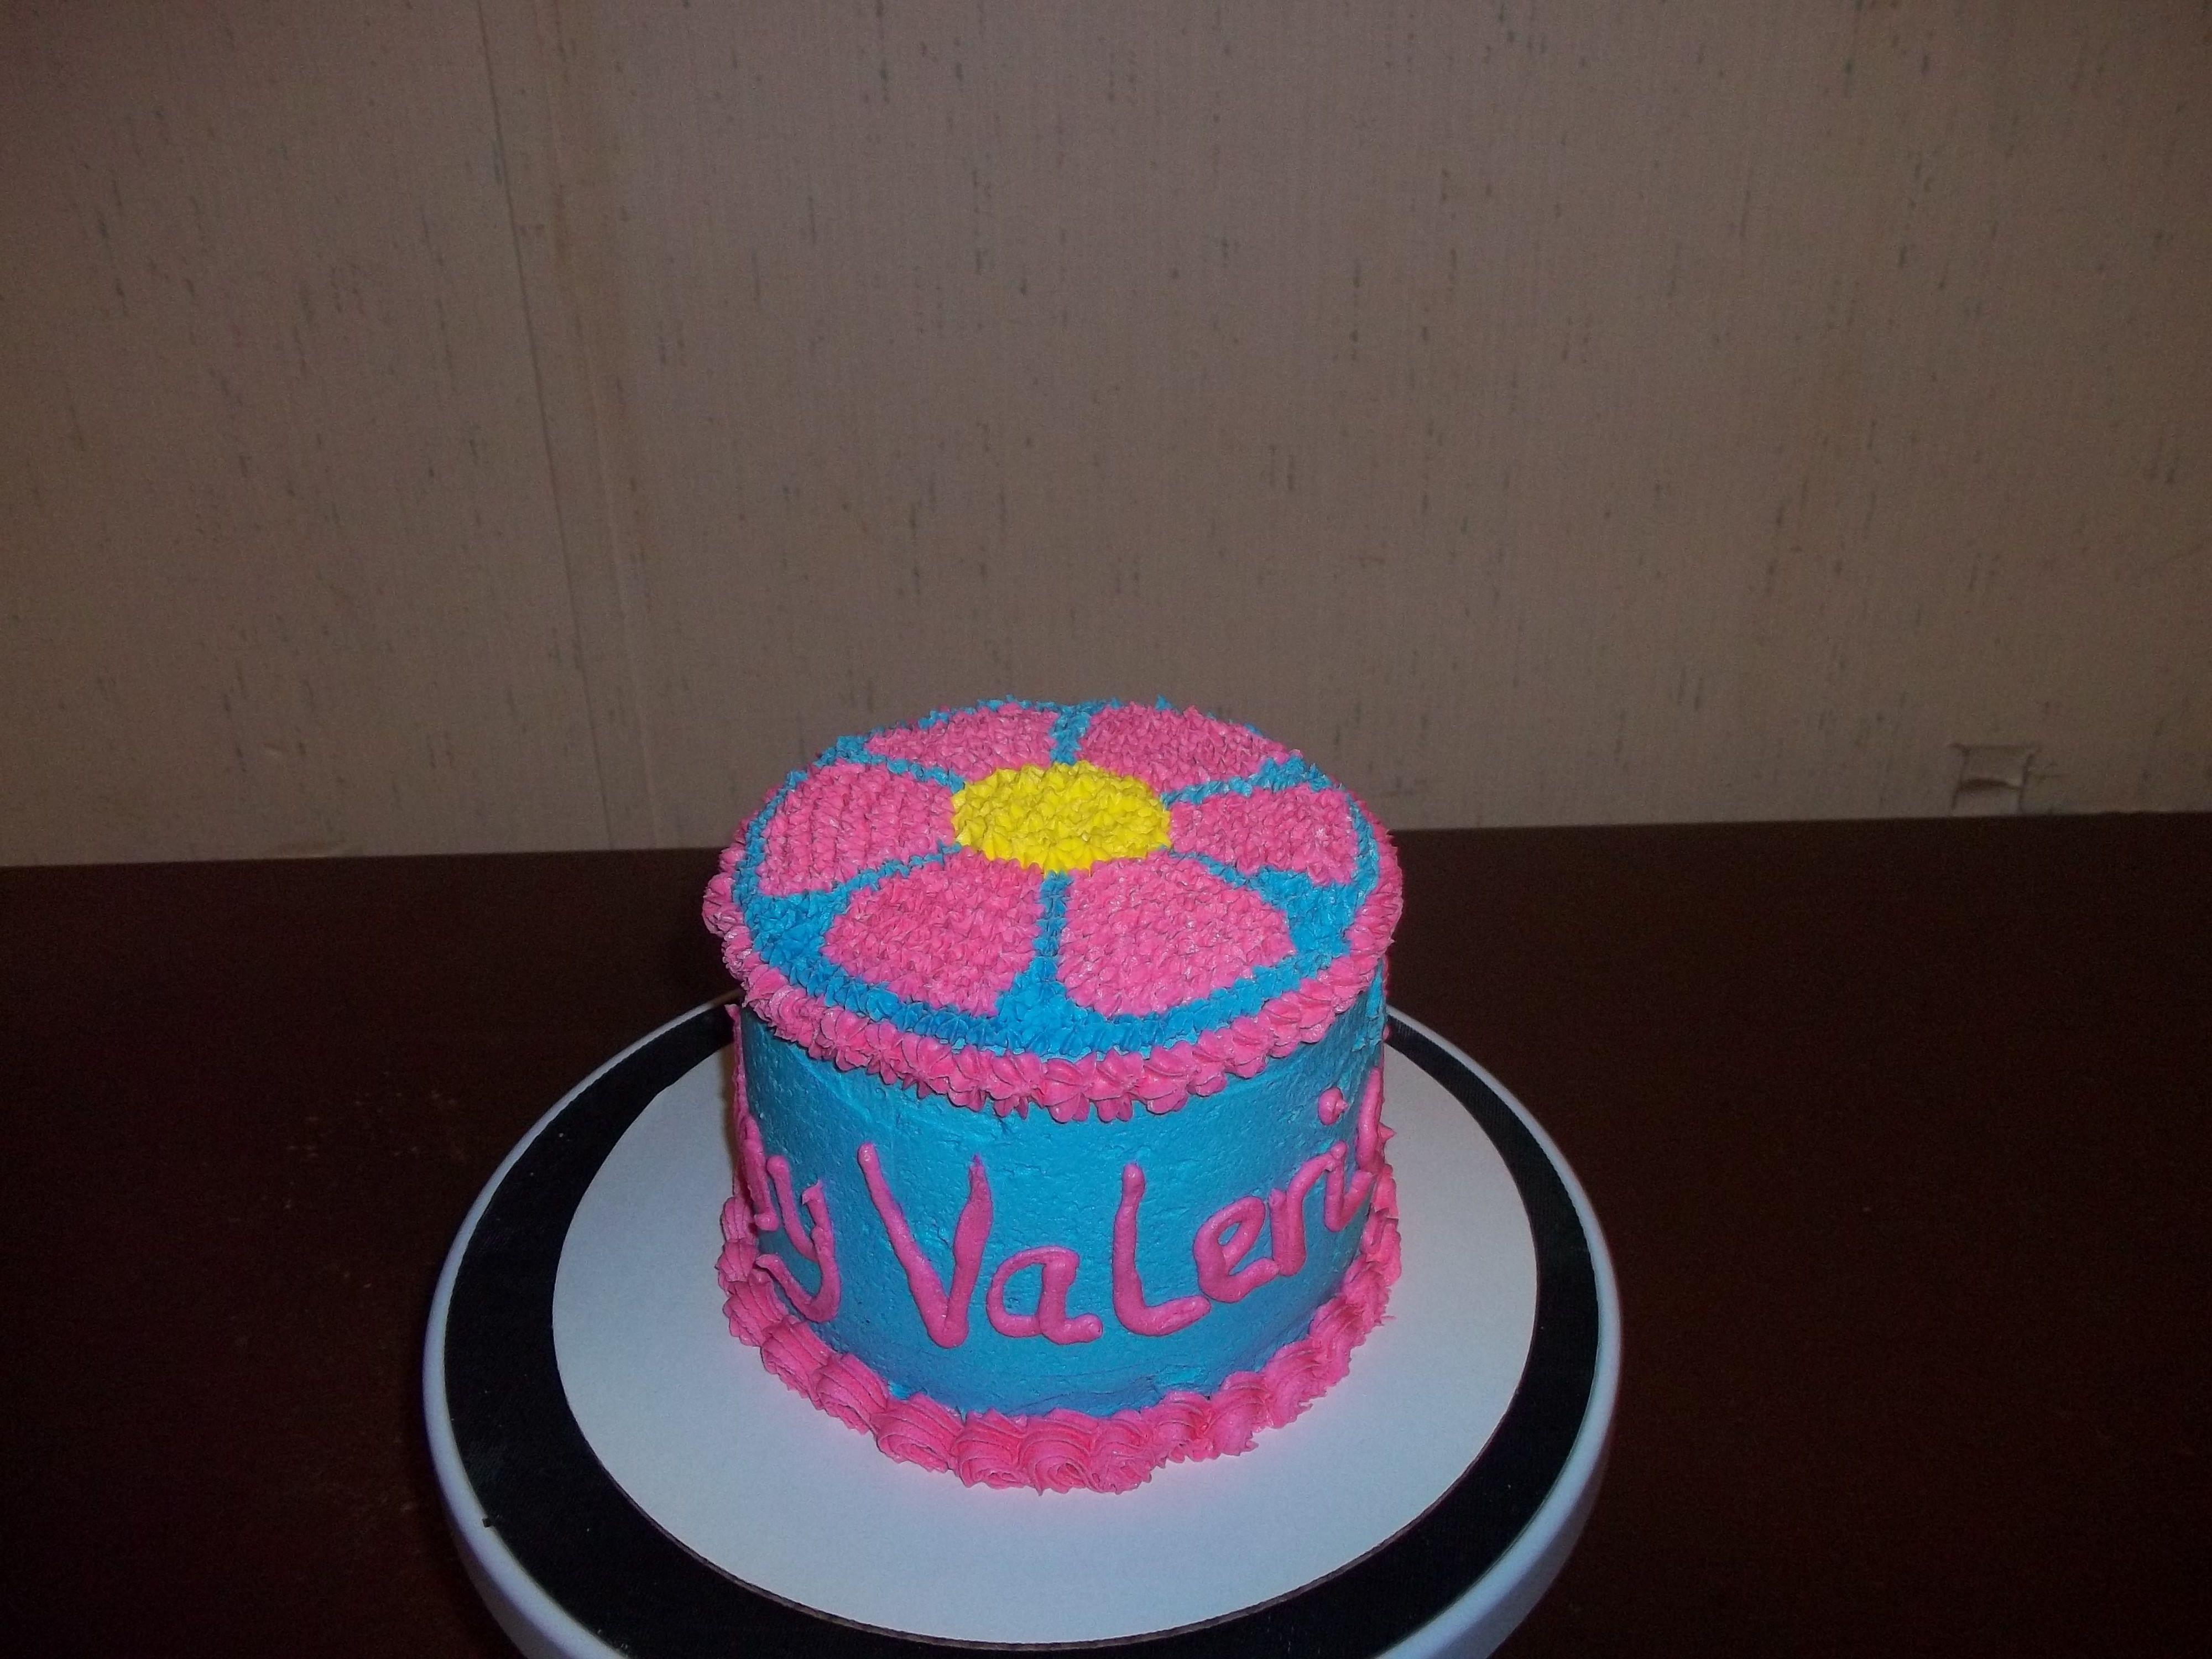 Awe Inspiring Birthday Cake I Made For Valerie Cake Birthday Cake Desserts Funny Birthday Cards Online Necthendildamsfinfo